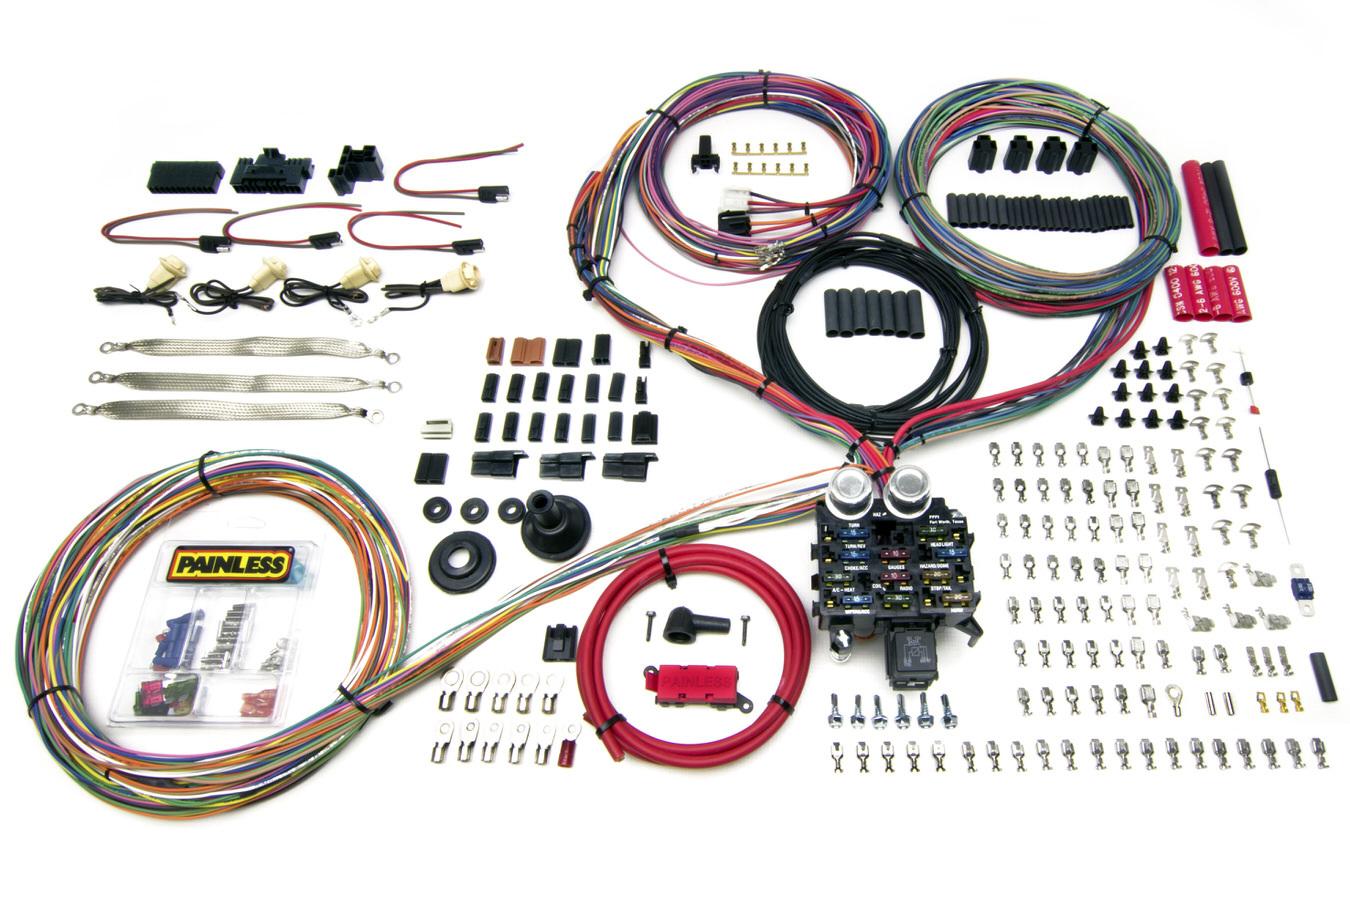 Painless Wiring 23 Circuit Harness - Pro Series GM Keyed Colum